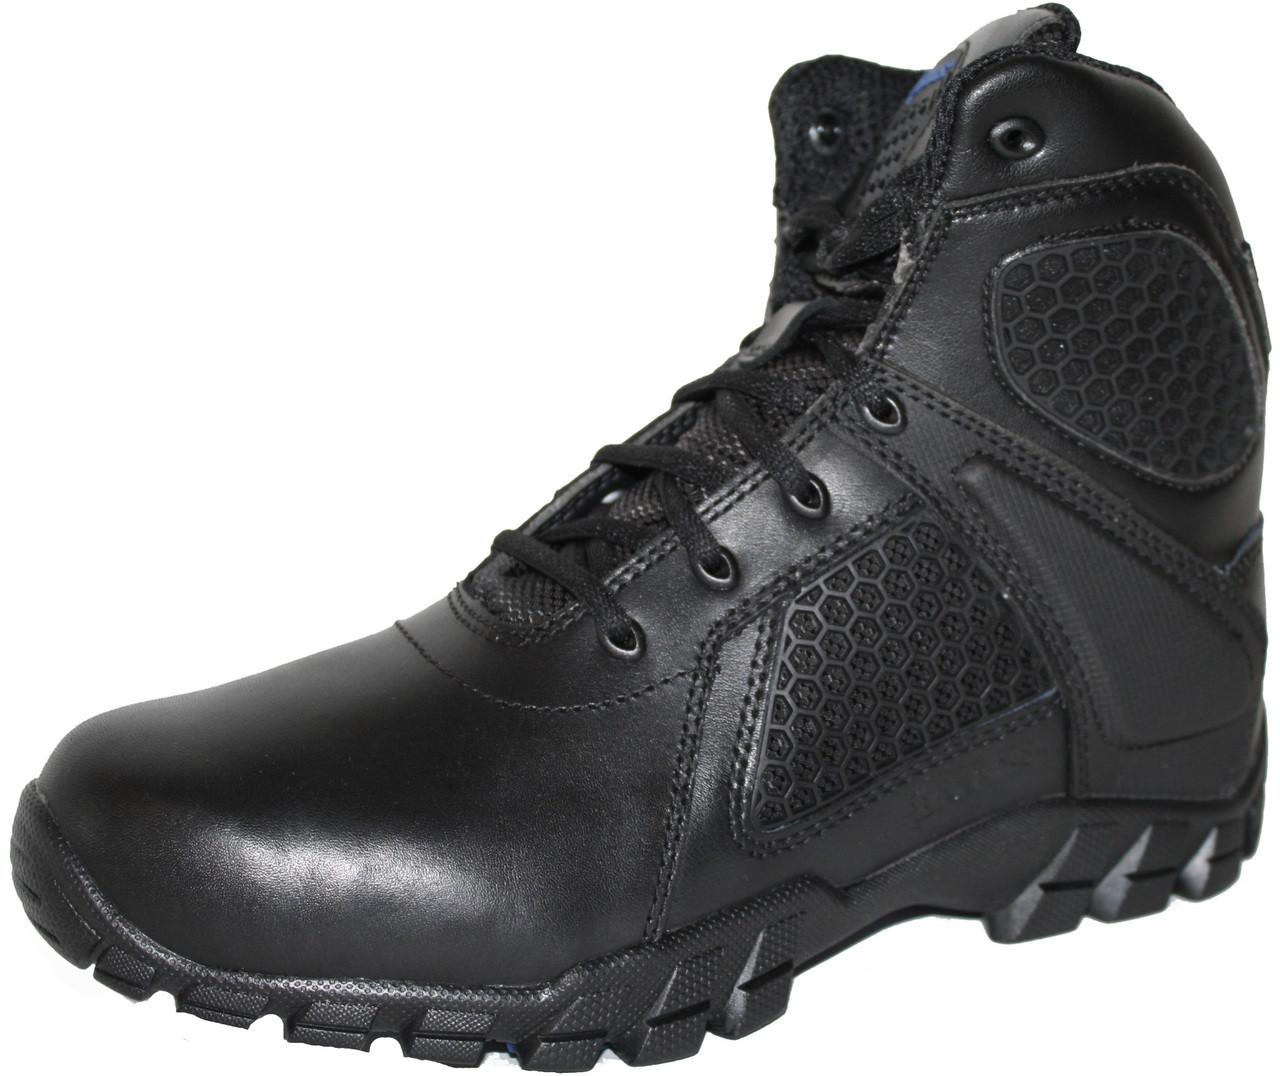 1b9dbc9538a Bates 7006-B Mens 6 Inch Strike Side Zip Waterproof Tactical Boot